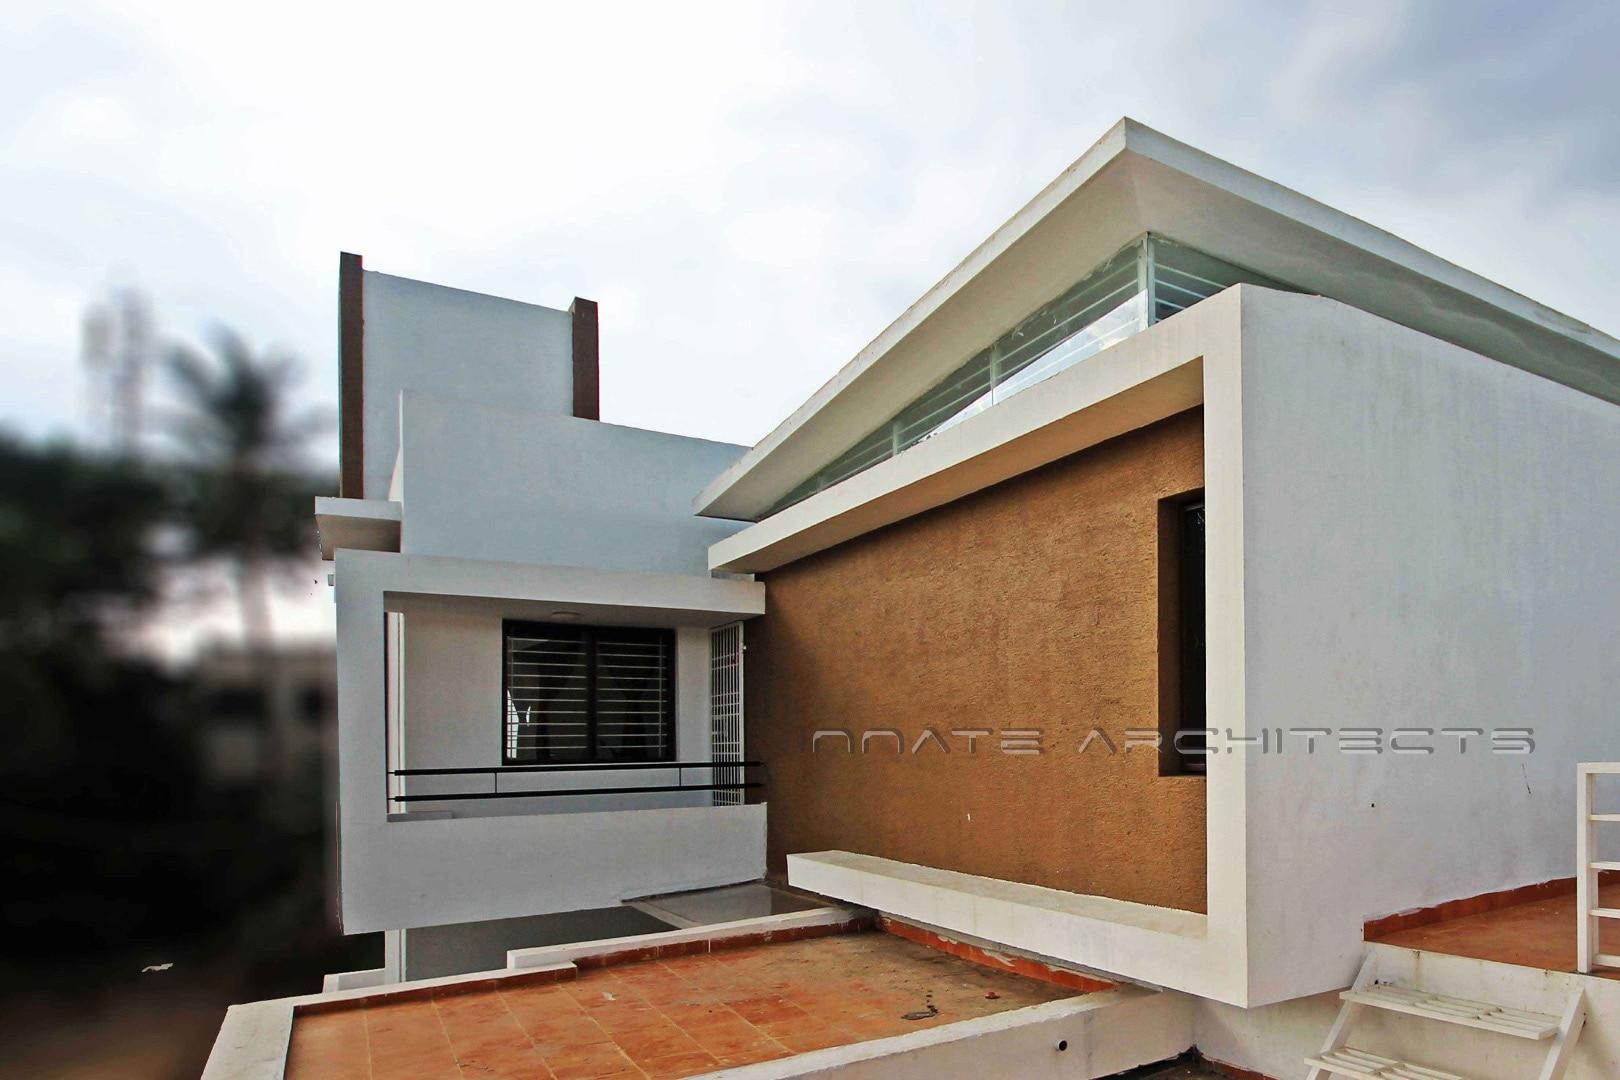 Innate Architects